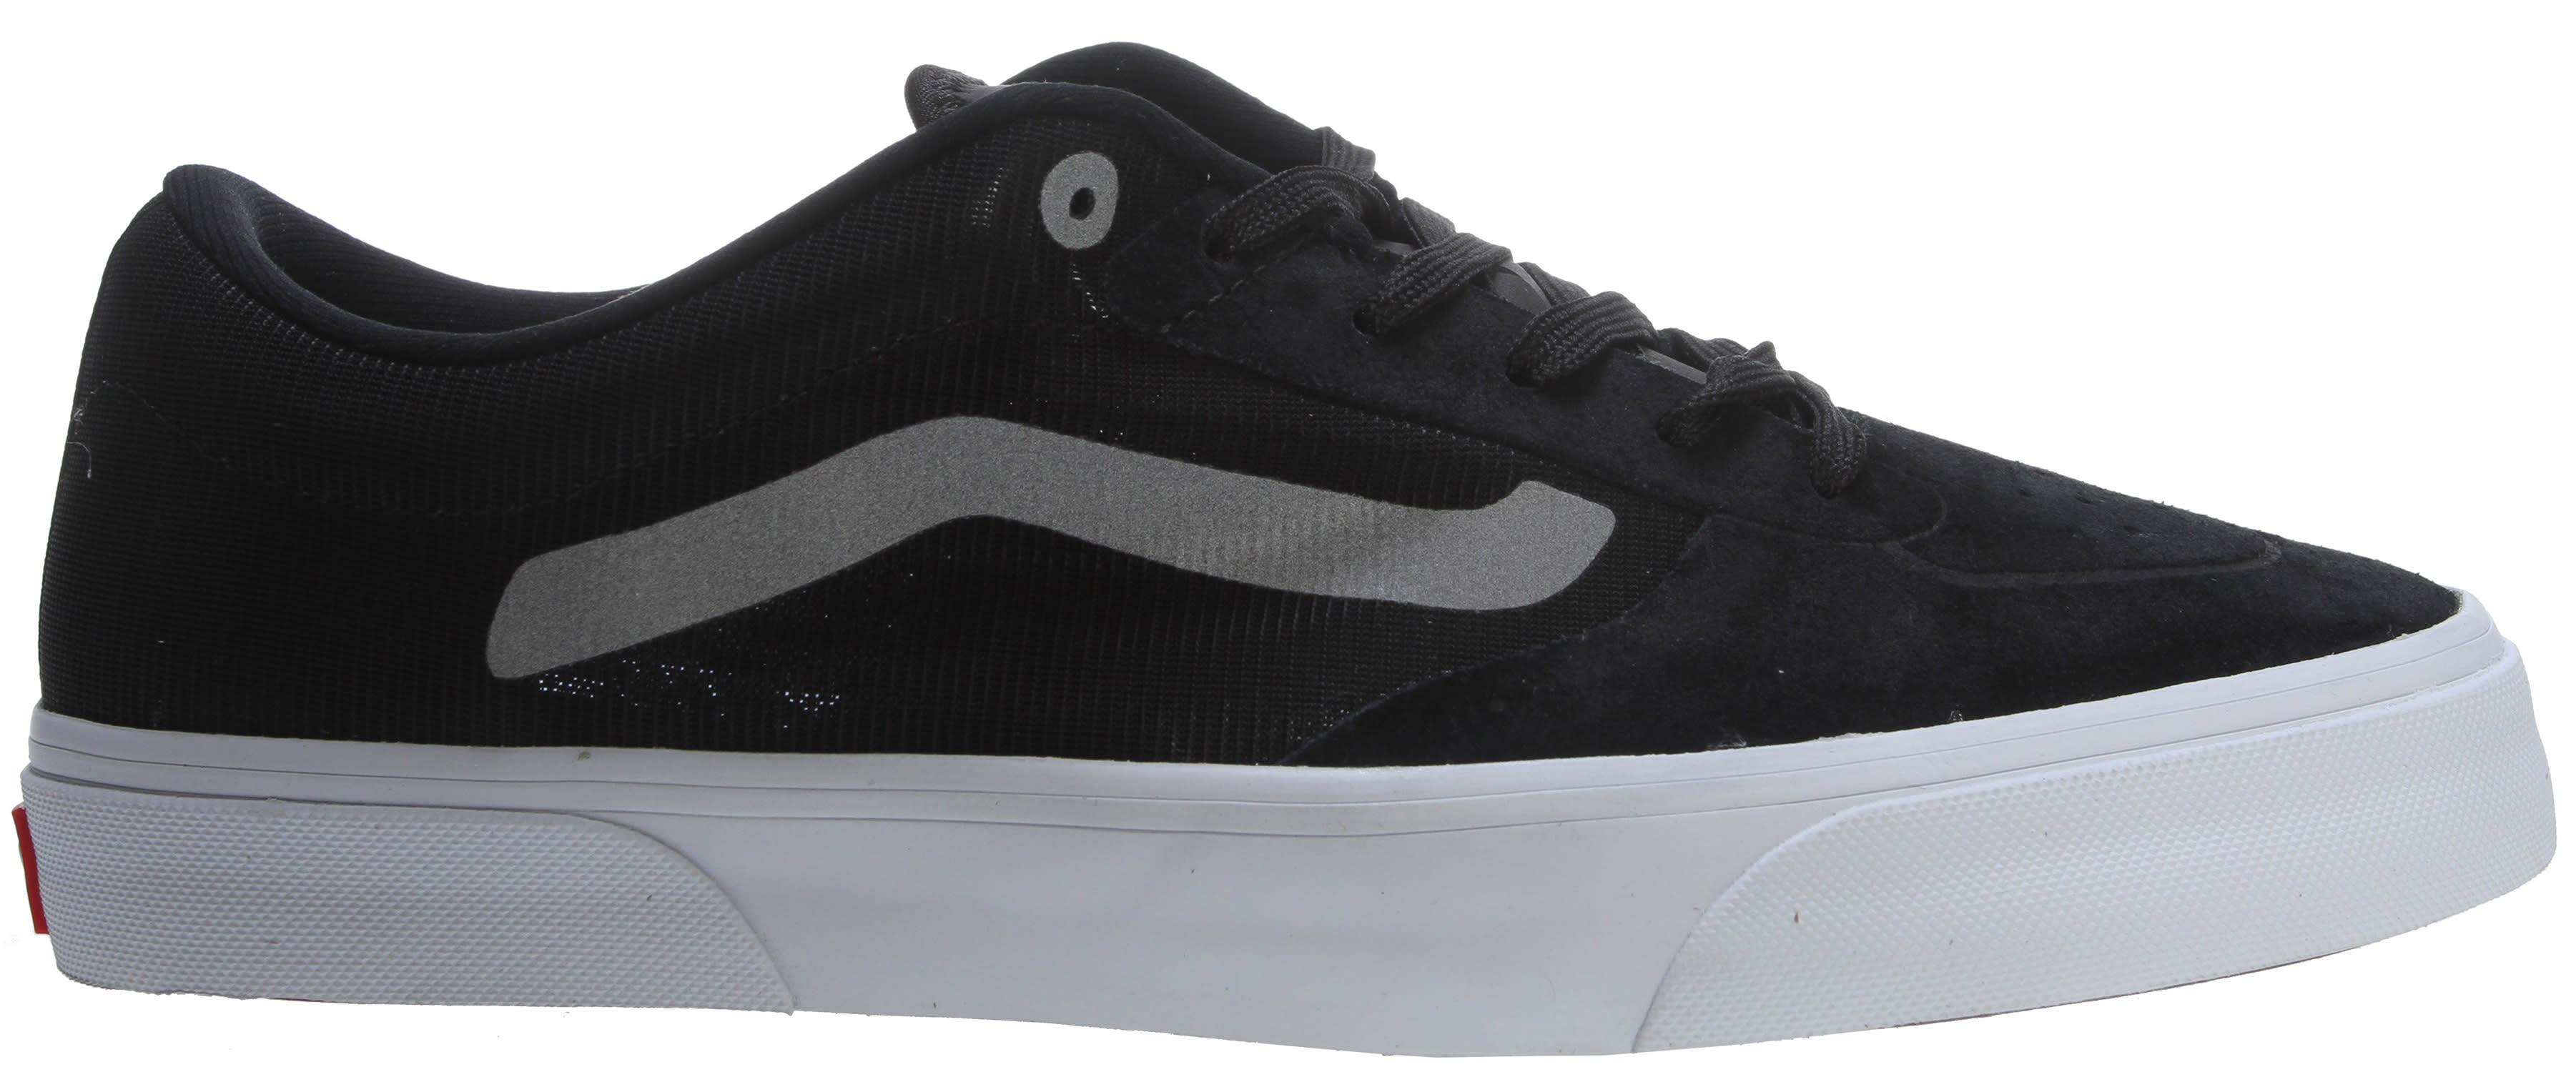 a6f65559f0 Vans Rowley Pro Lite Skate Shoes - thumbnail 1